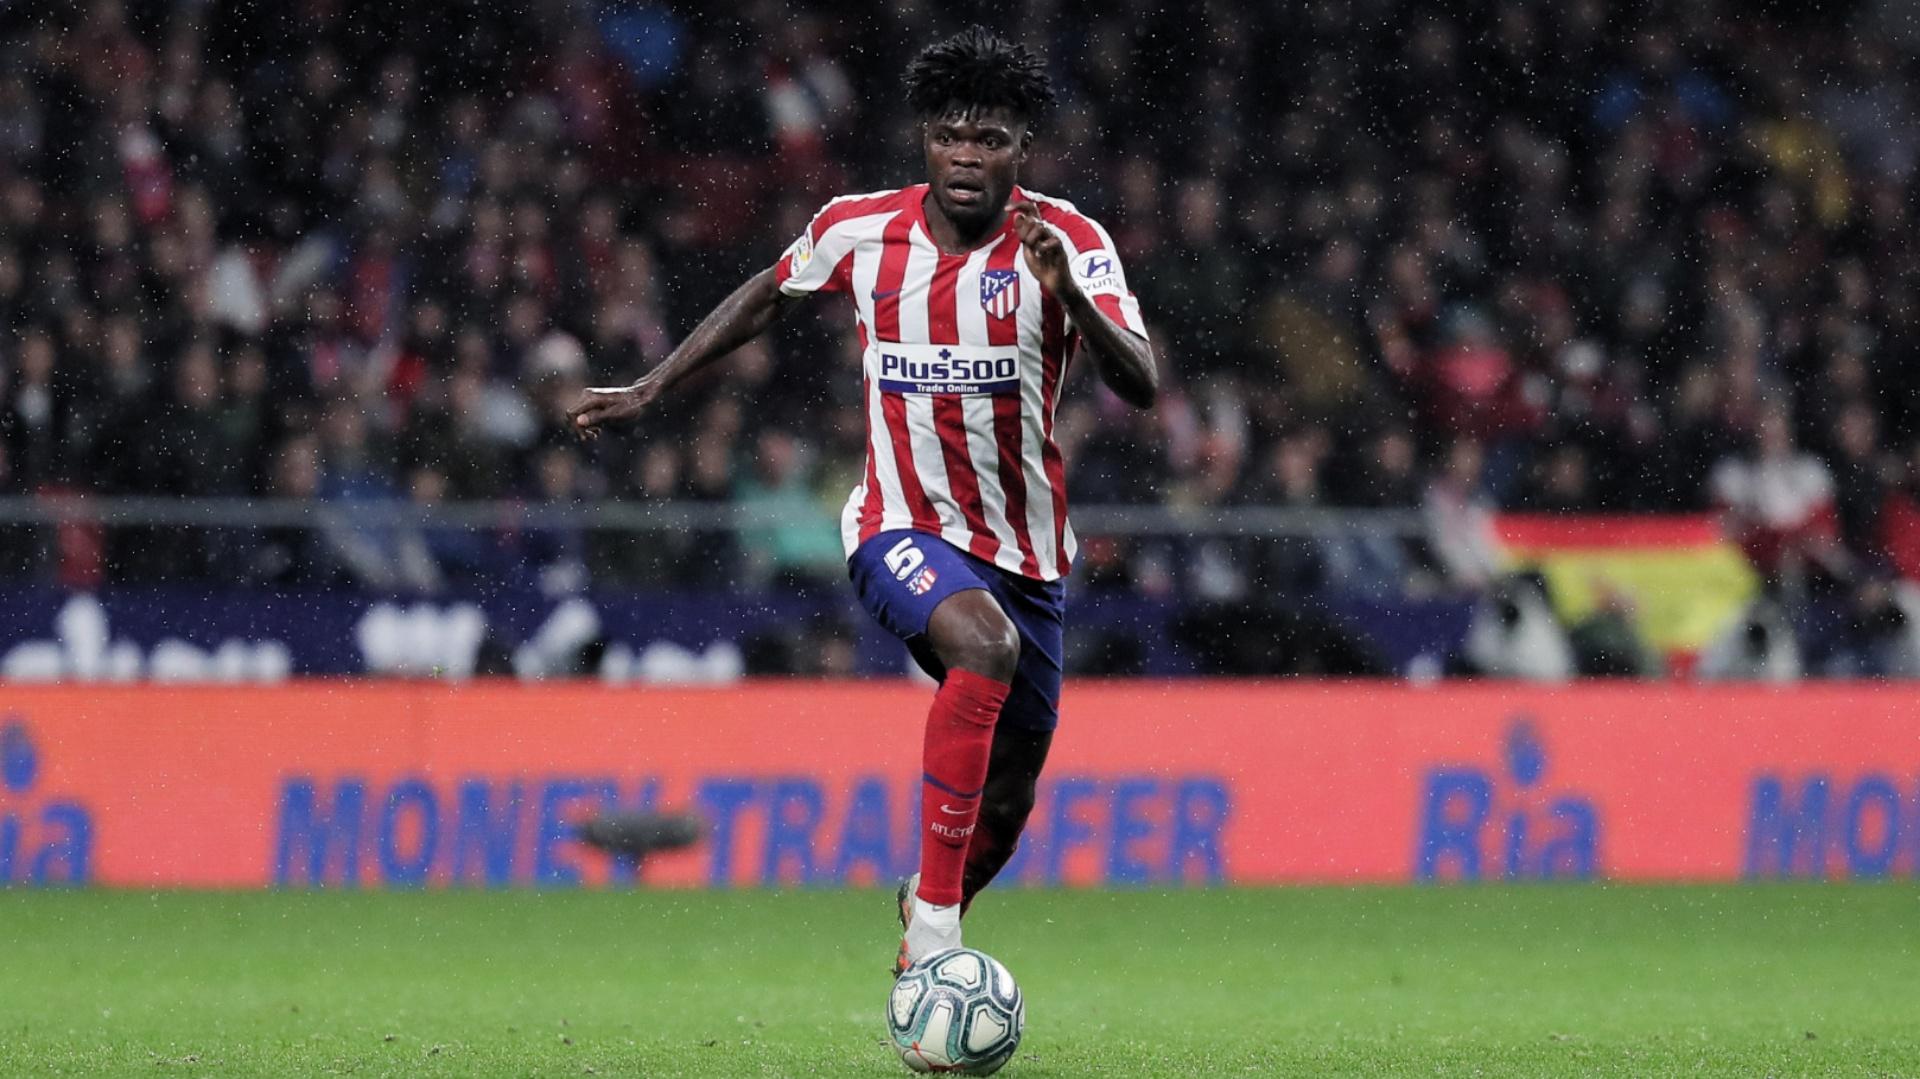 Top Five: Africans in La Liga this season